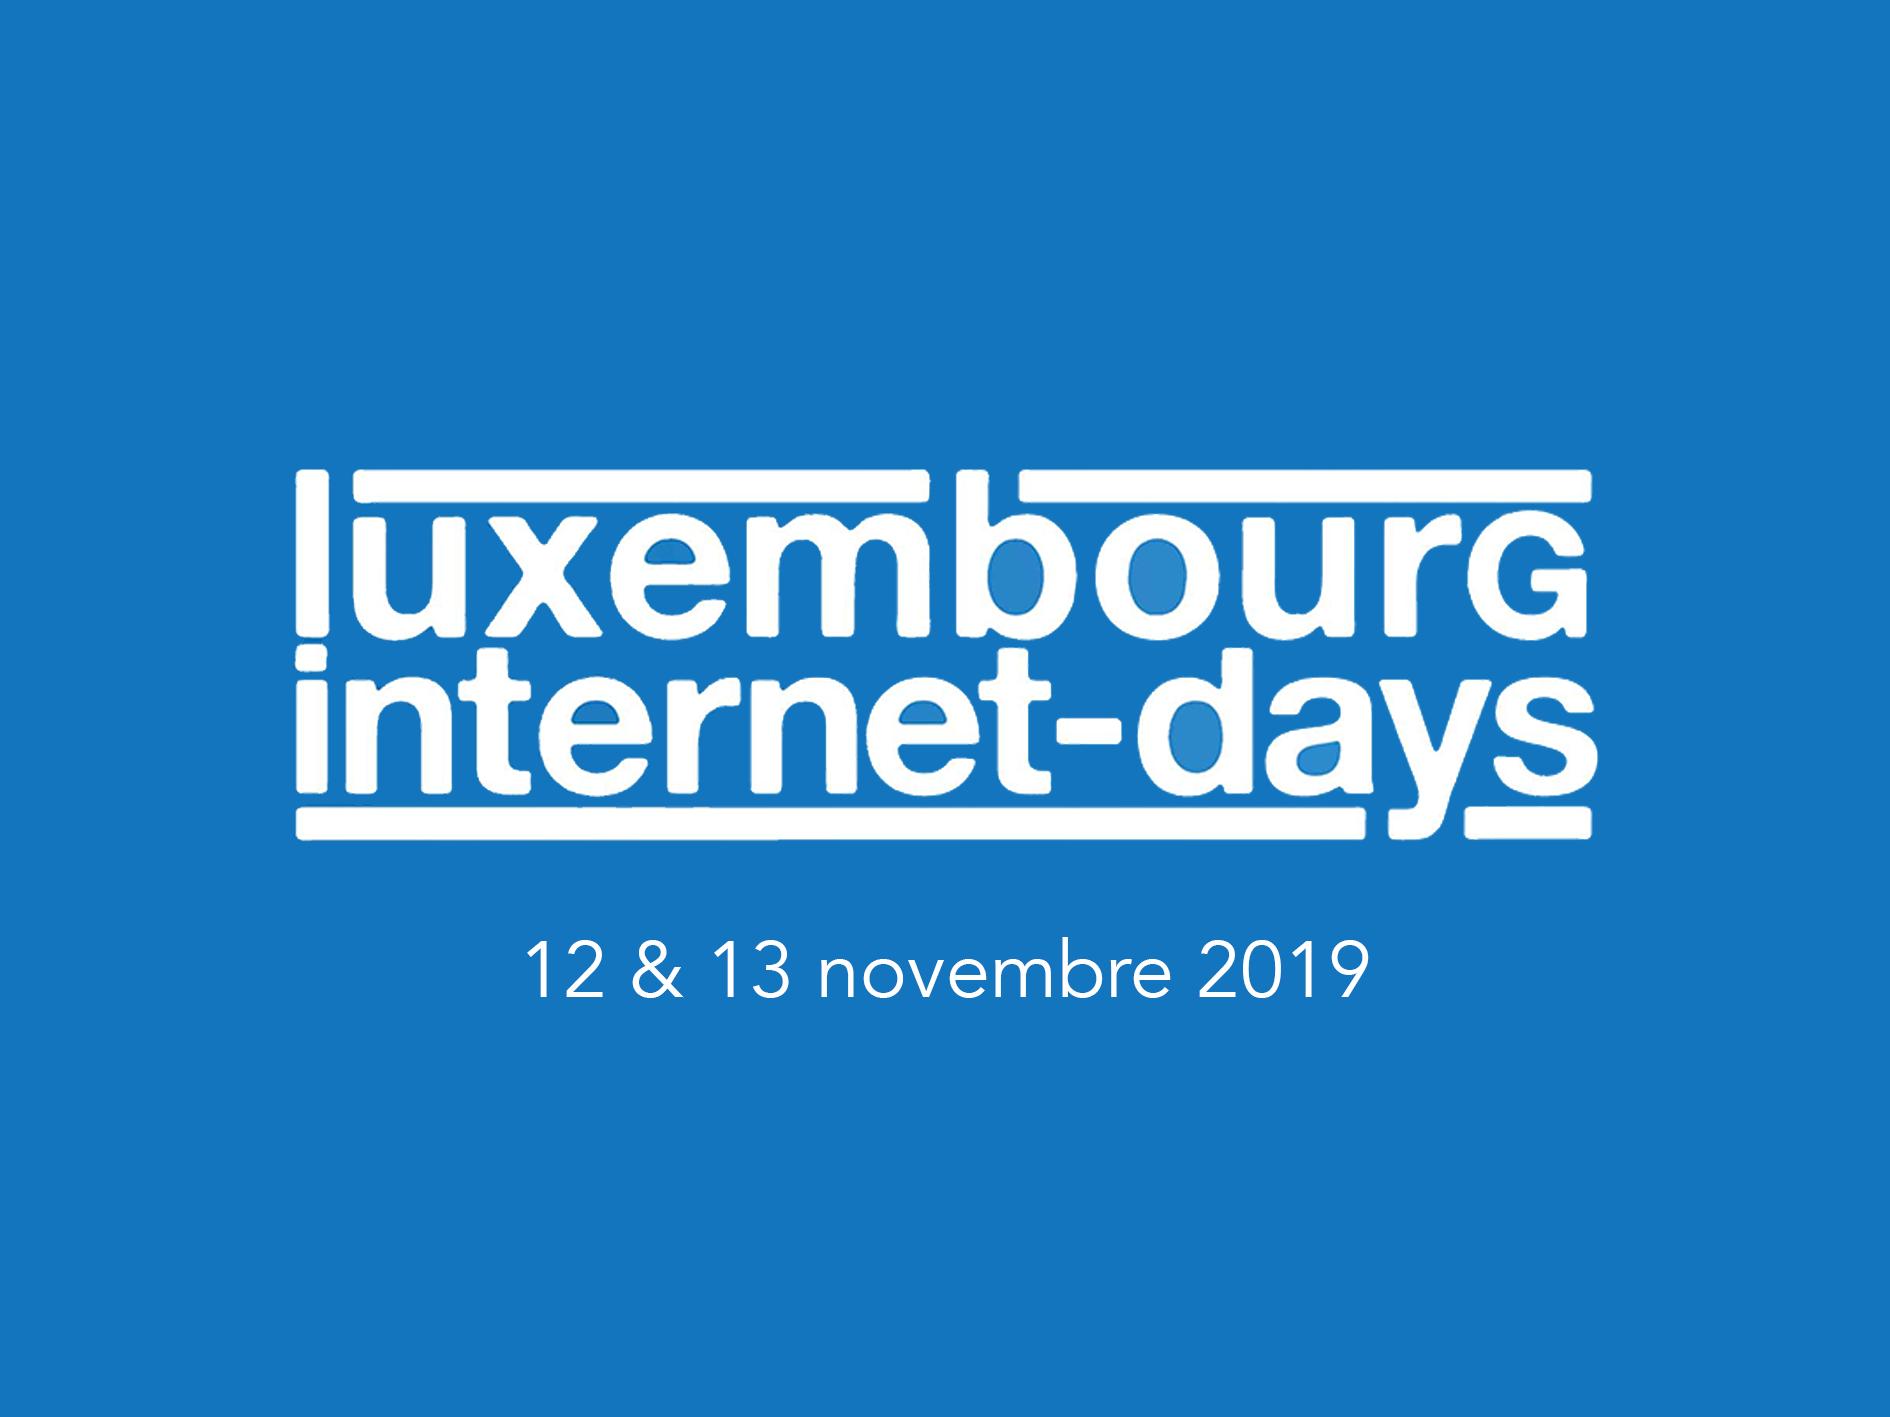 Luxembourg Internet Days 12 - 13 nov 2019